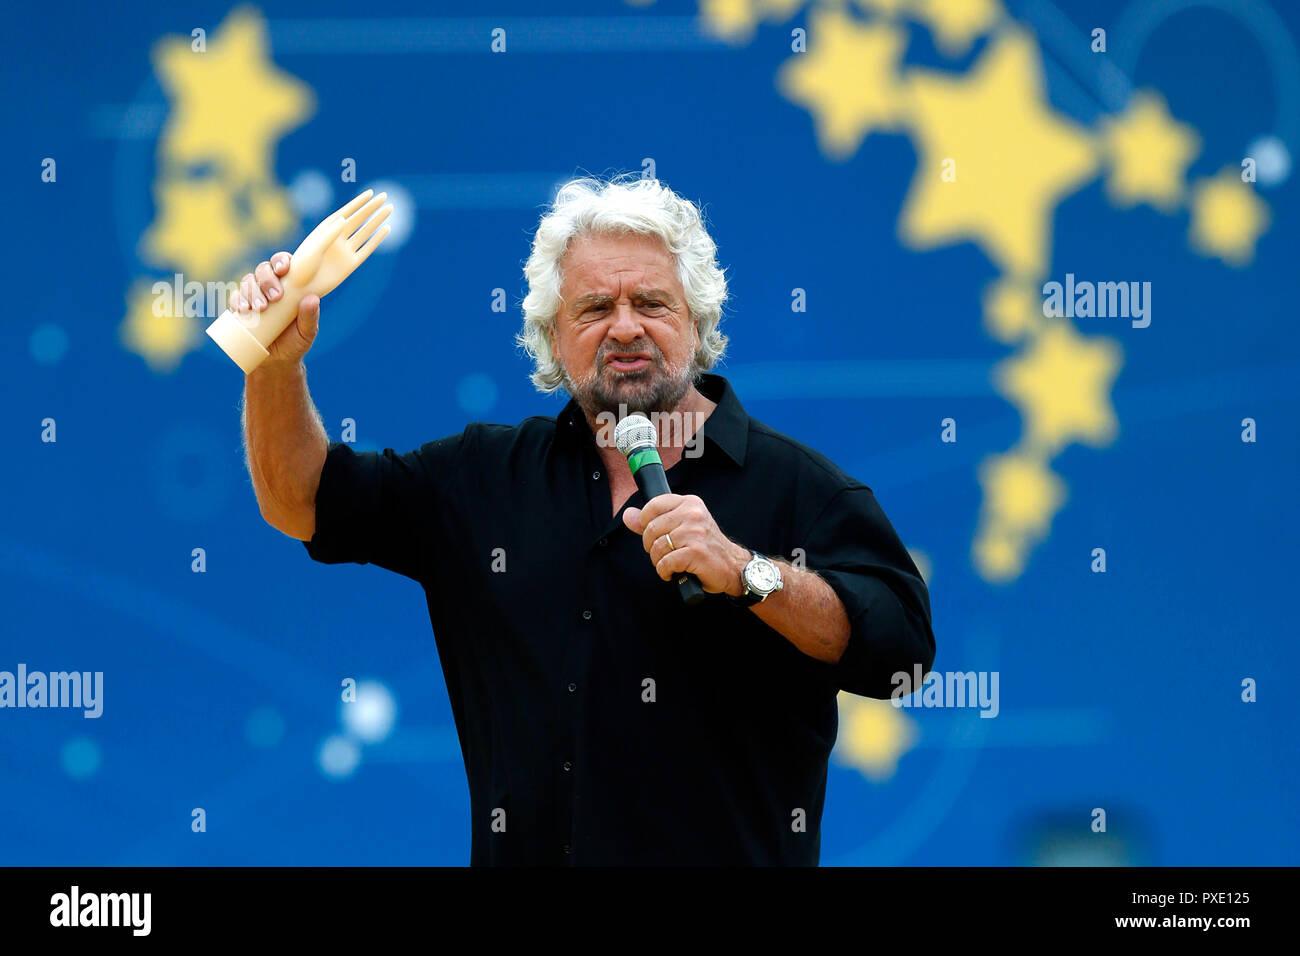 Beppe Grillo Roma 21/10/2018. El Circo Massimo. Convención evento Italia 5 Stelle. Roma, 21 de octubre de 2018. Convenio 'Italia 5 Estrellas'. Foto Samantha Zucchi Insidefoto Foto de stock